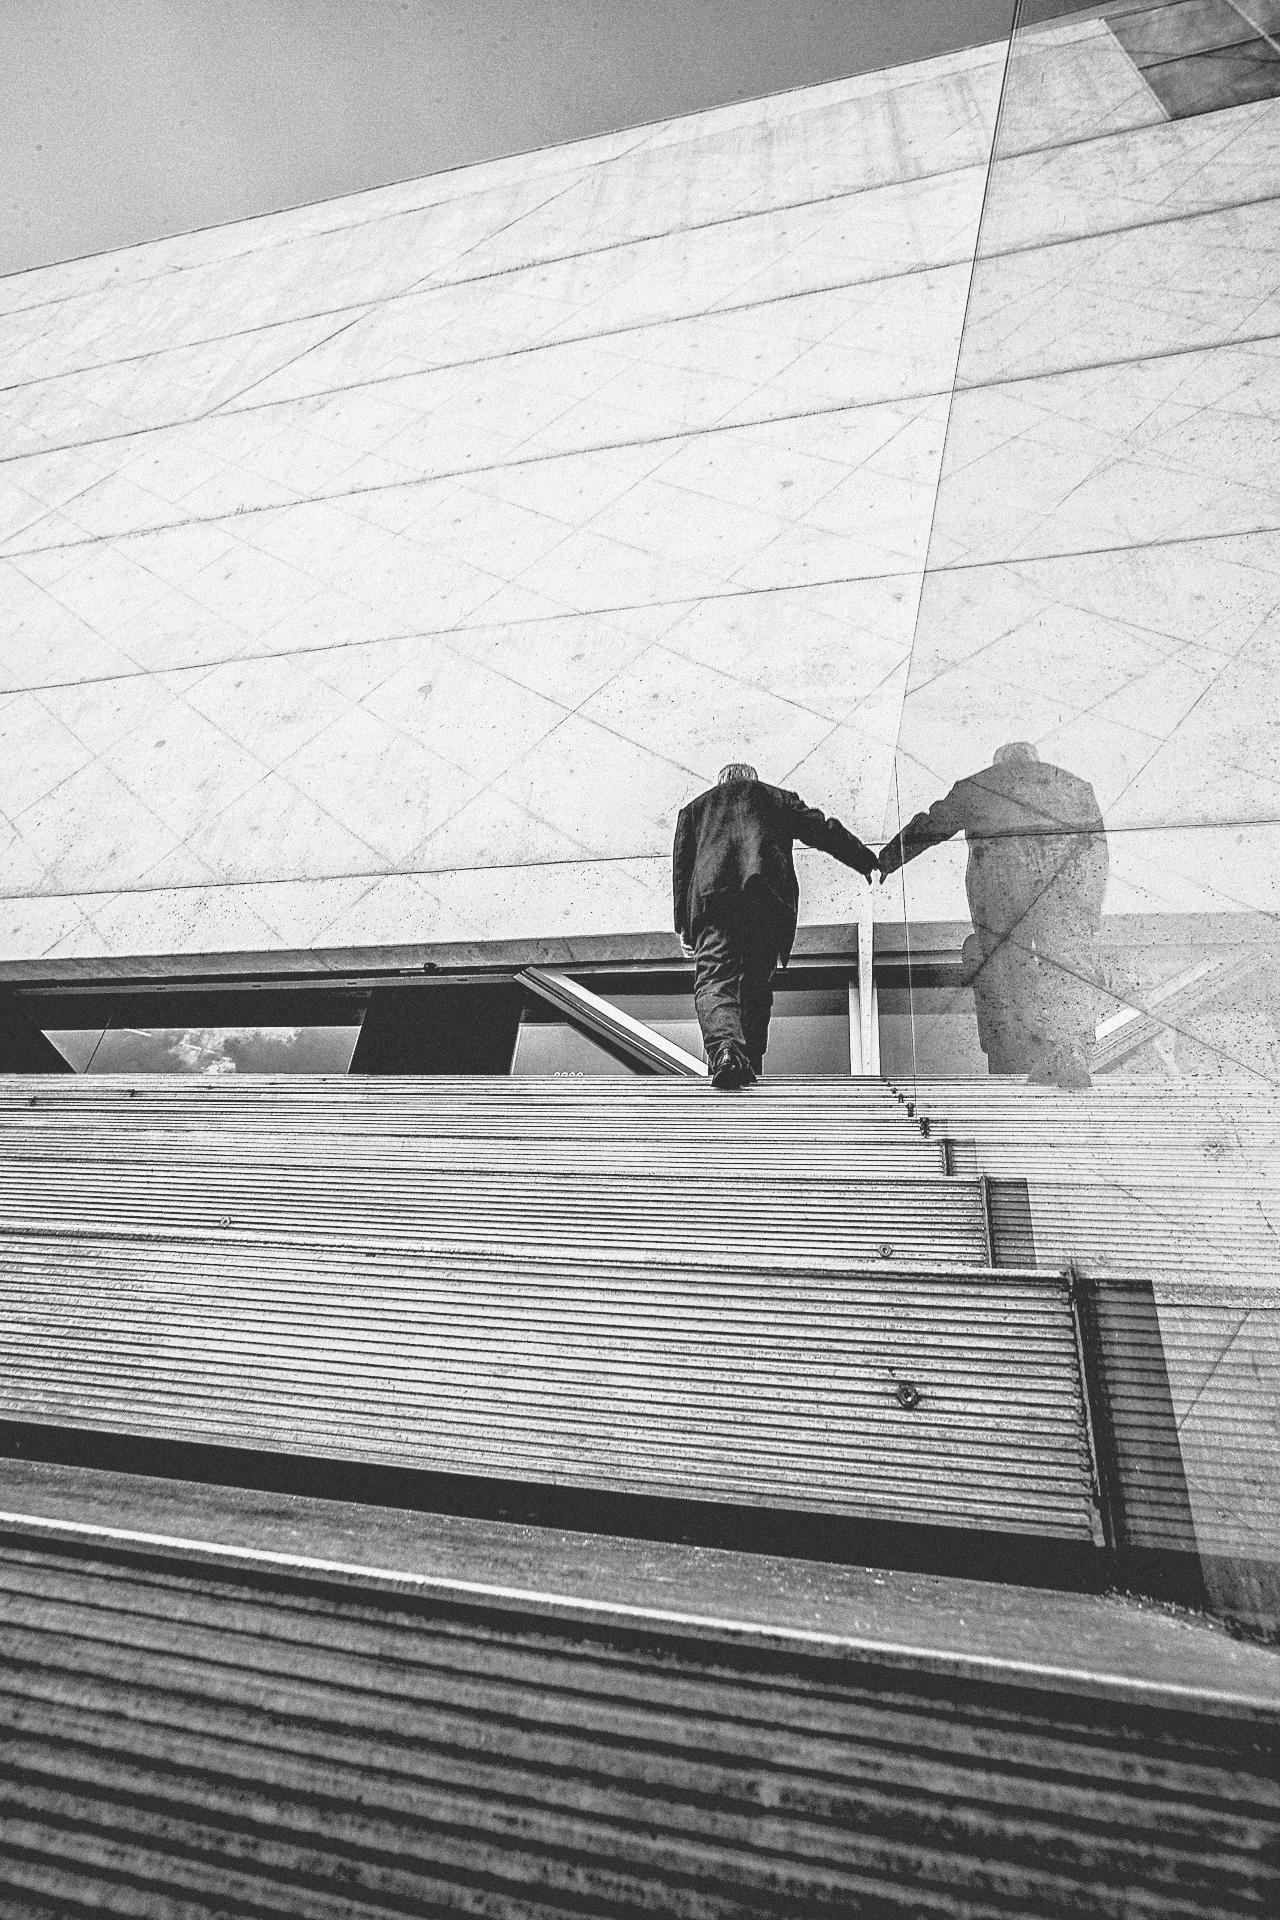 10-Aniversario-Casa-da-Musica-Porto-Reportagem-Fotografica-Photographic-Coverage-Fotografia-Photography-Arquitectura-Architecture-Rem-Koolhaas-bonjourmolotov-01N4.jpg